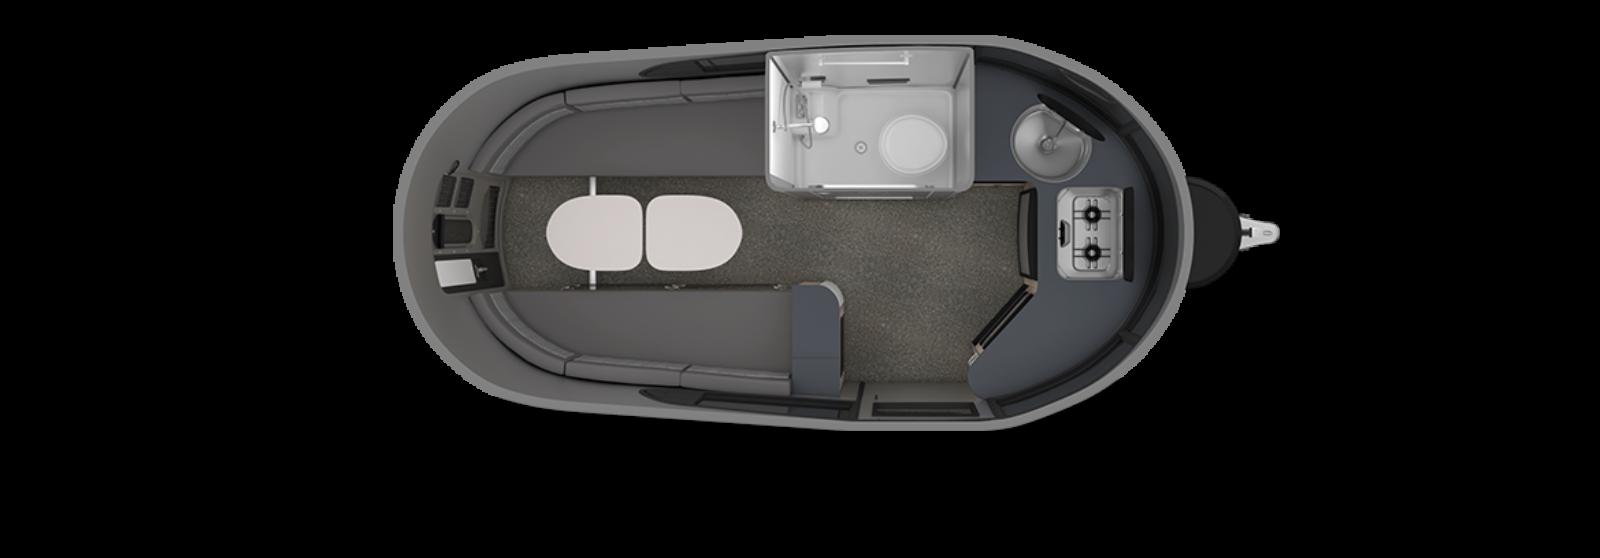 Airstream-Basecamp-Red-Rock-Floor-Plan